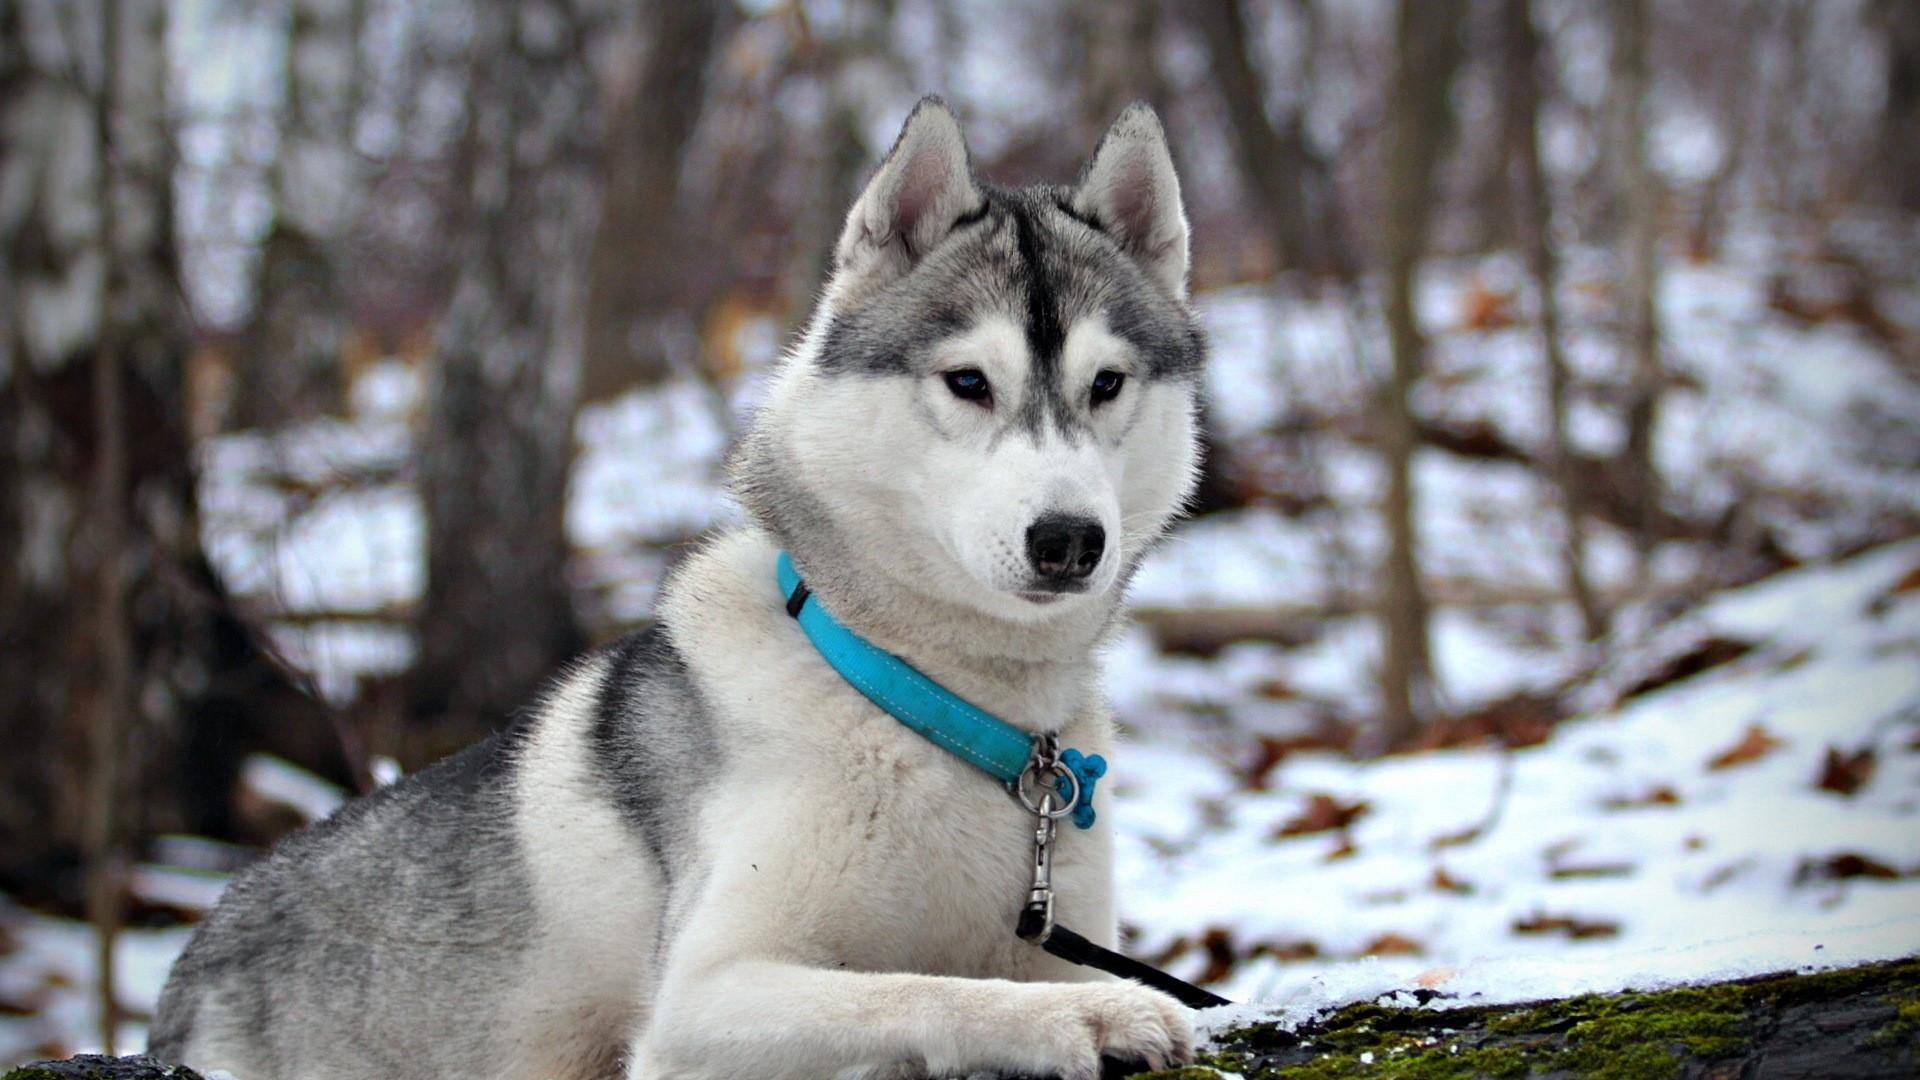 Perros Husky Siberiano Fondos De Pantalla Hd De Animales 2: Siberian Huskies Wallpapers (86+ Images